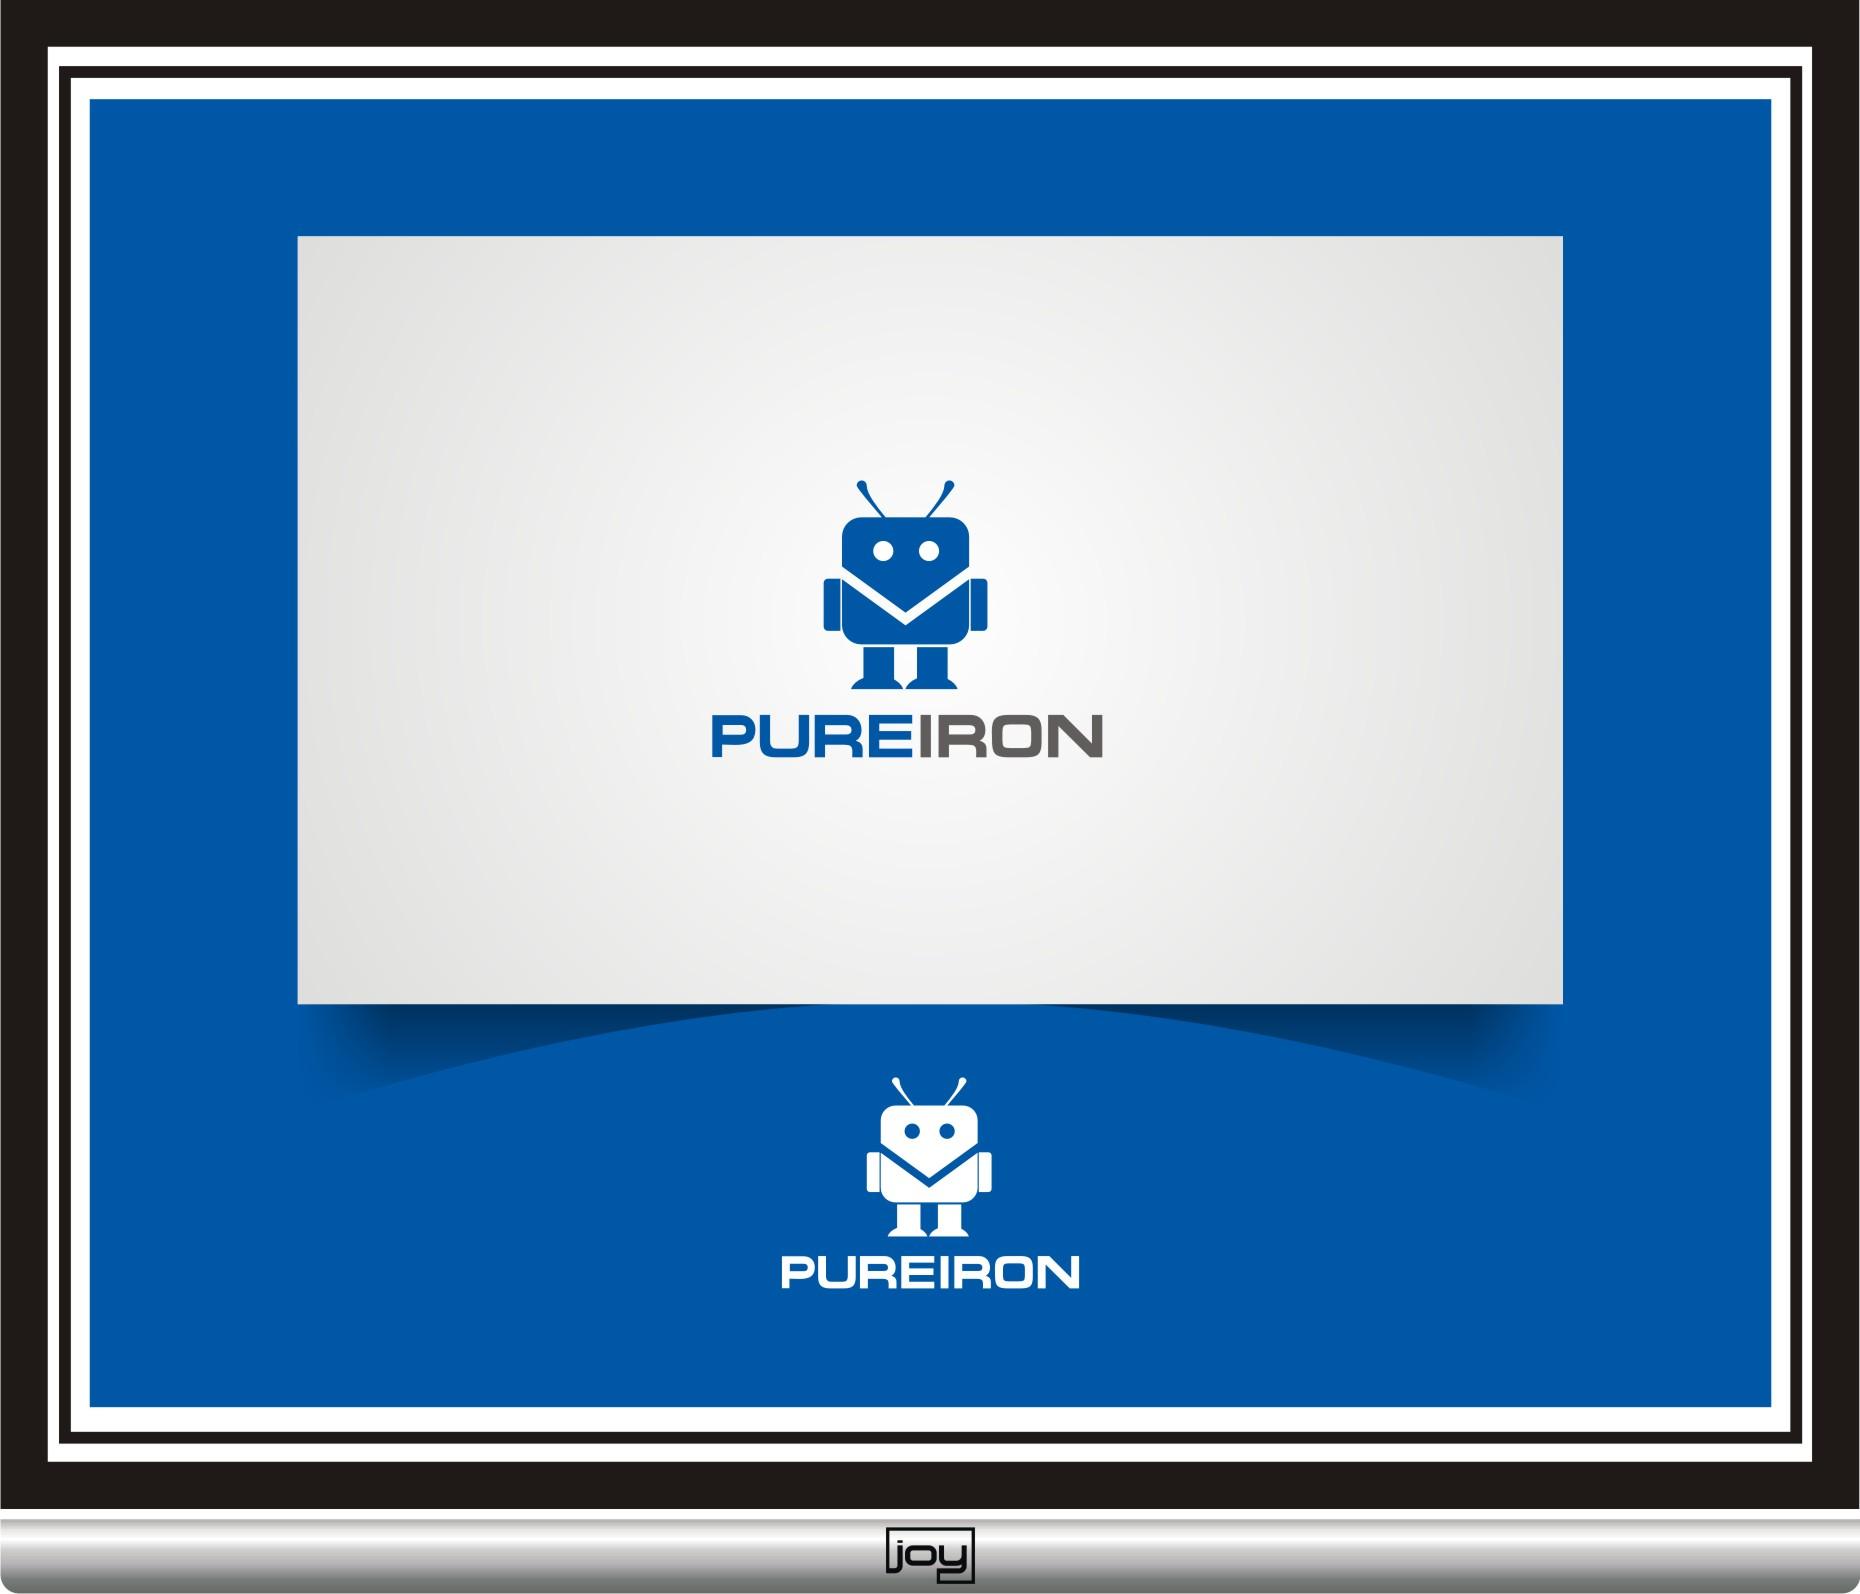 Logo Design by joysetiawan - Entry No. 145 in the Logo Design Contest Fun Logo Design for Pure Iron.